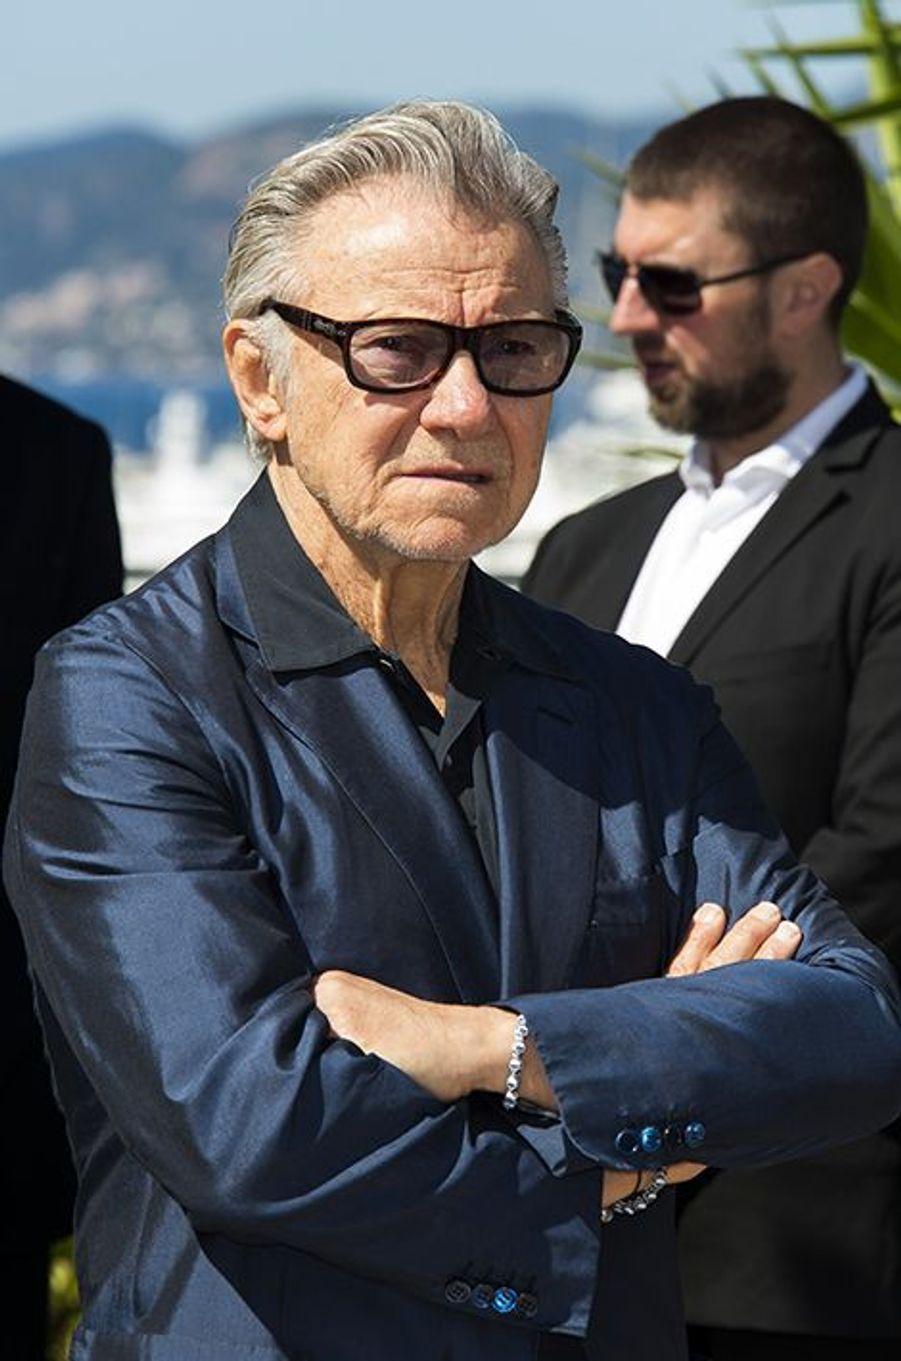 Harvey Keitel à Cannes le 20 mai 2015